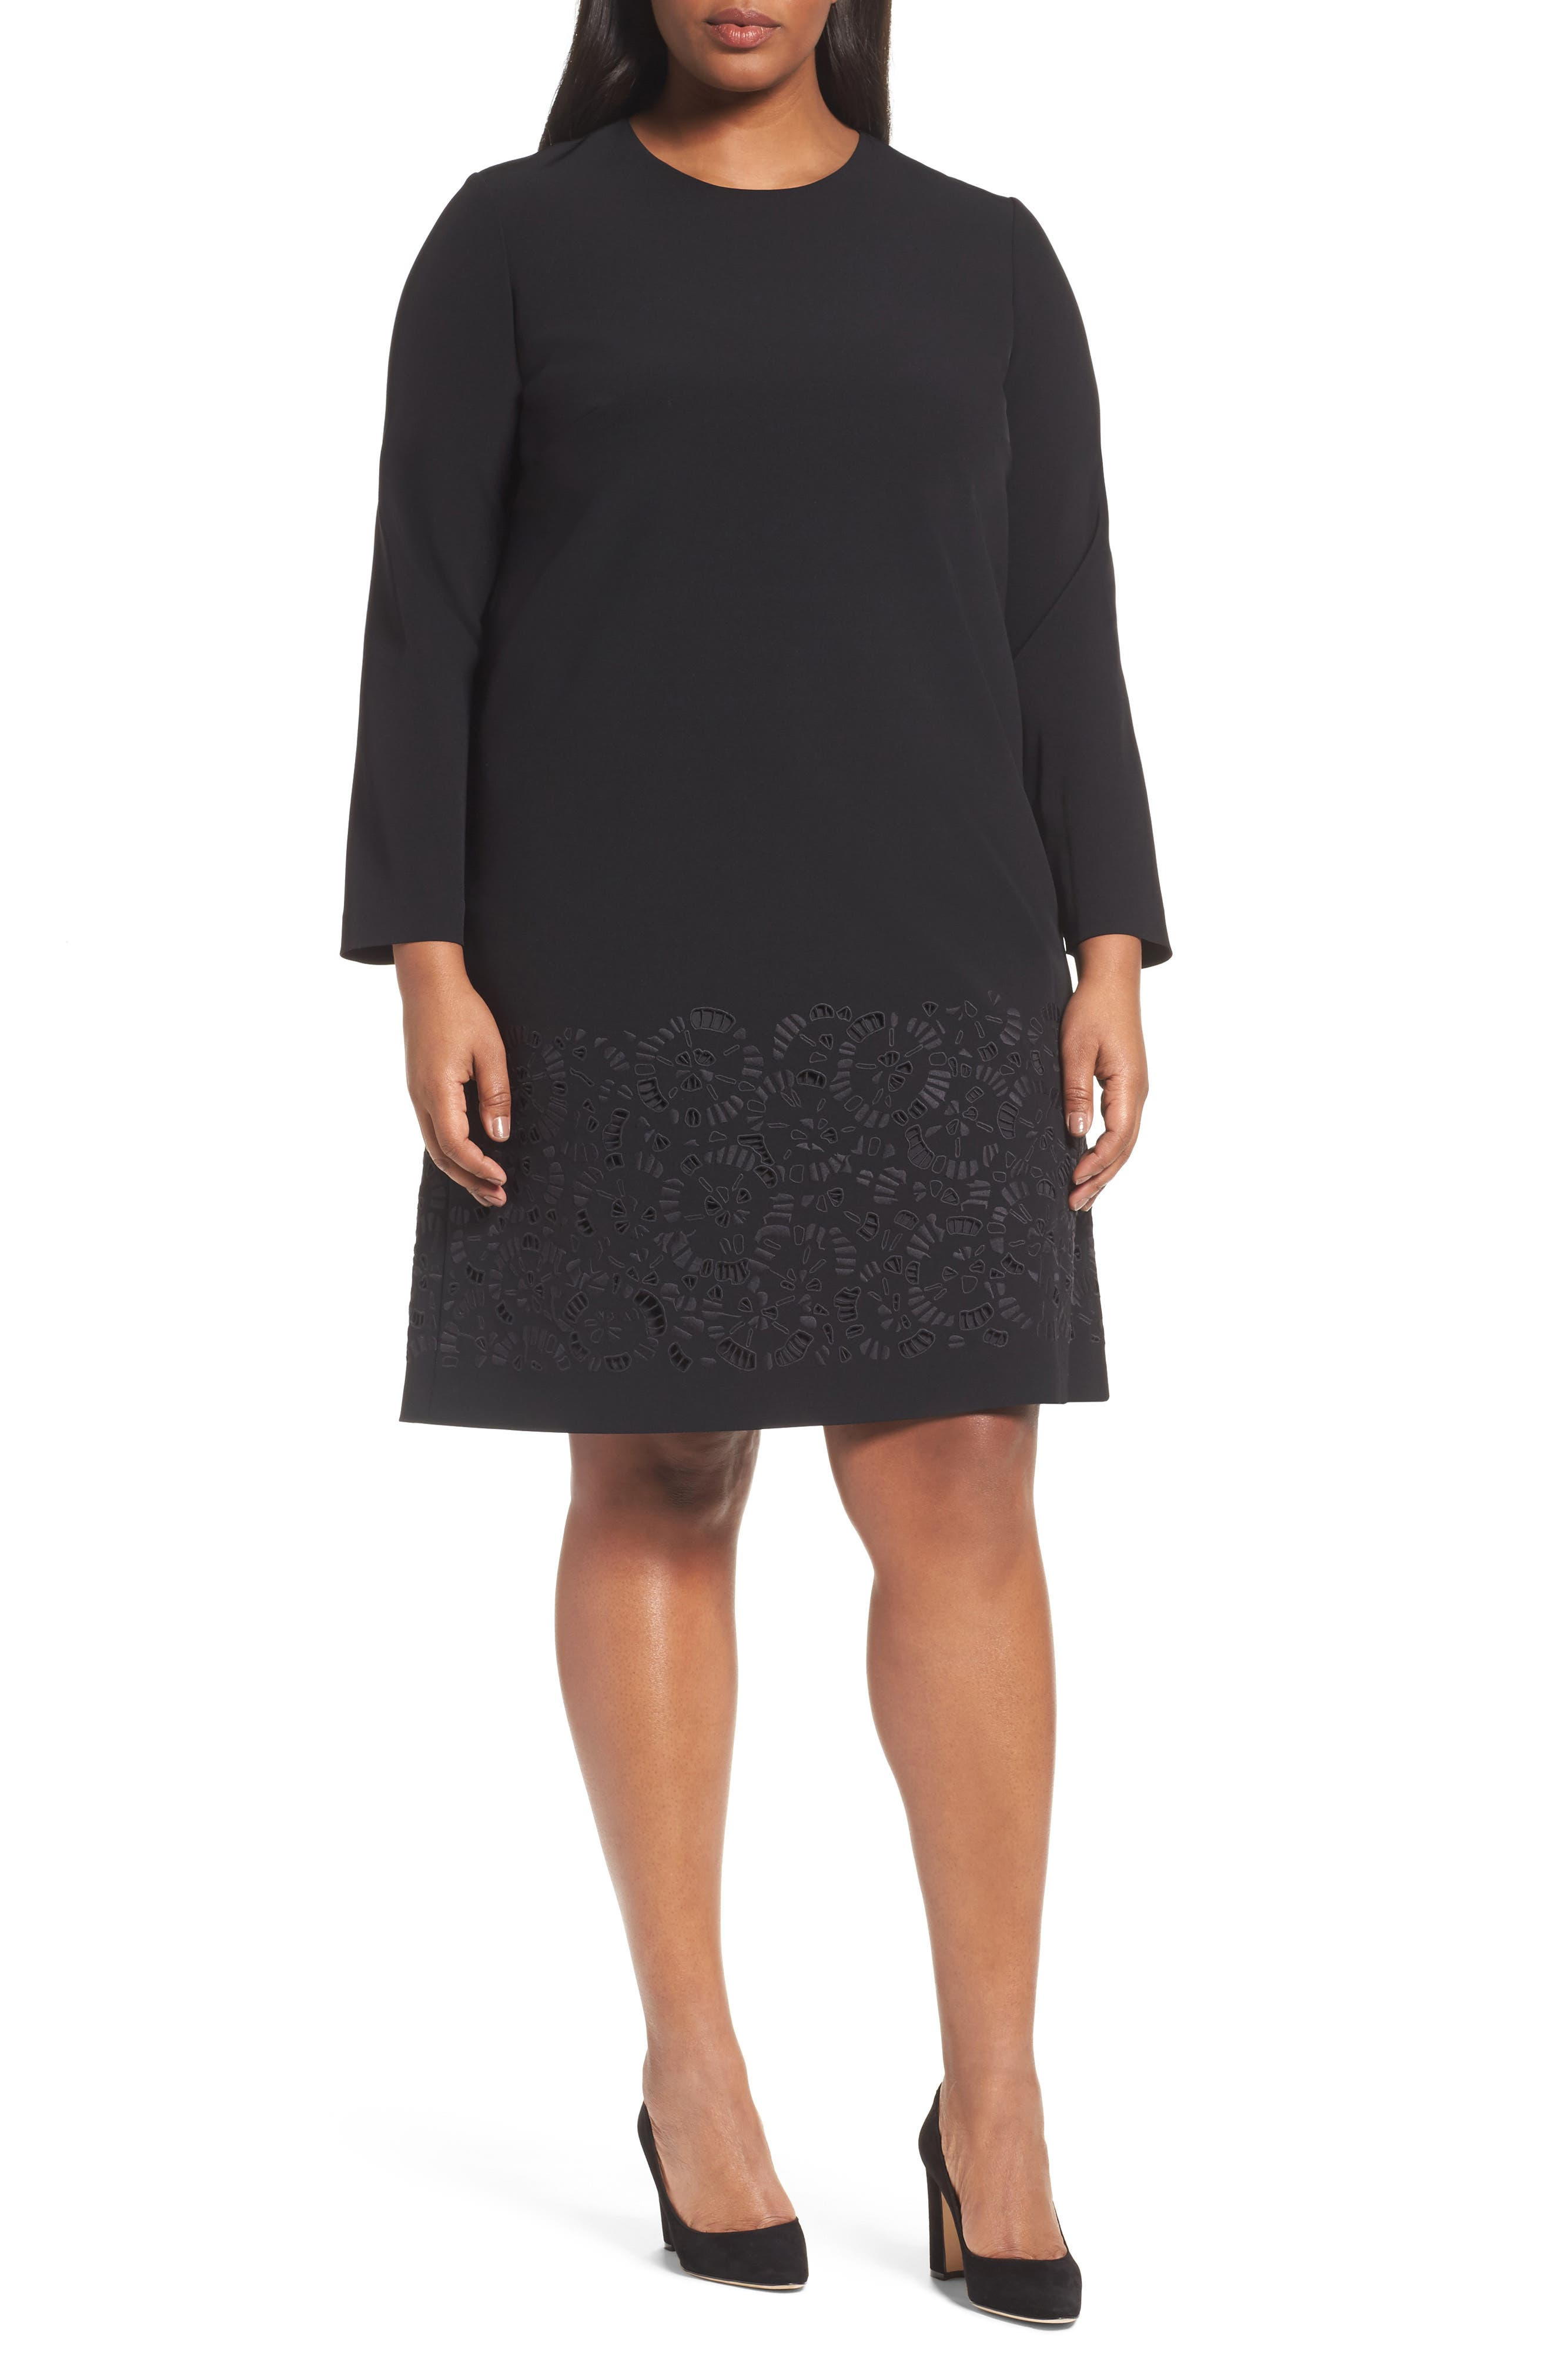 Corbin Laser Cut Dress,                         Main,                         color, 001